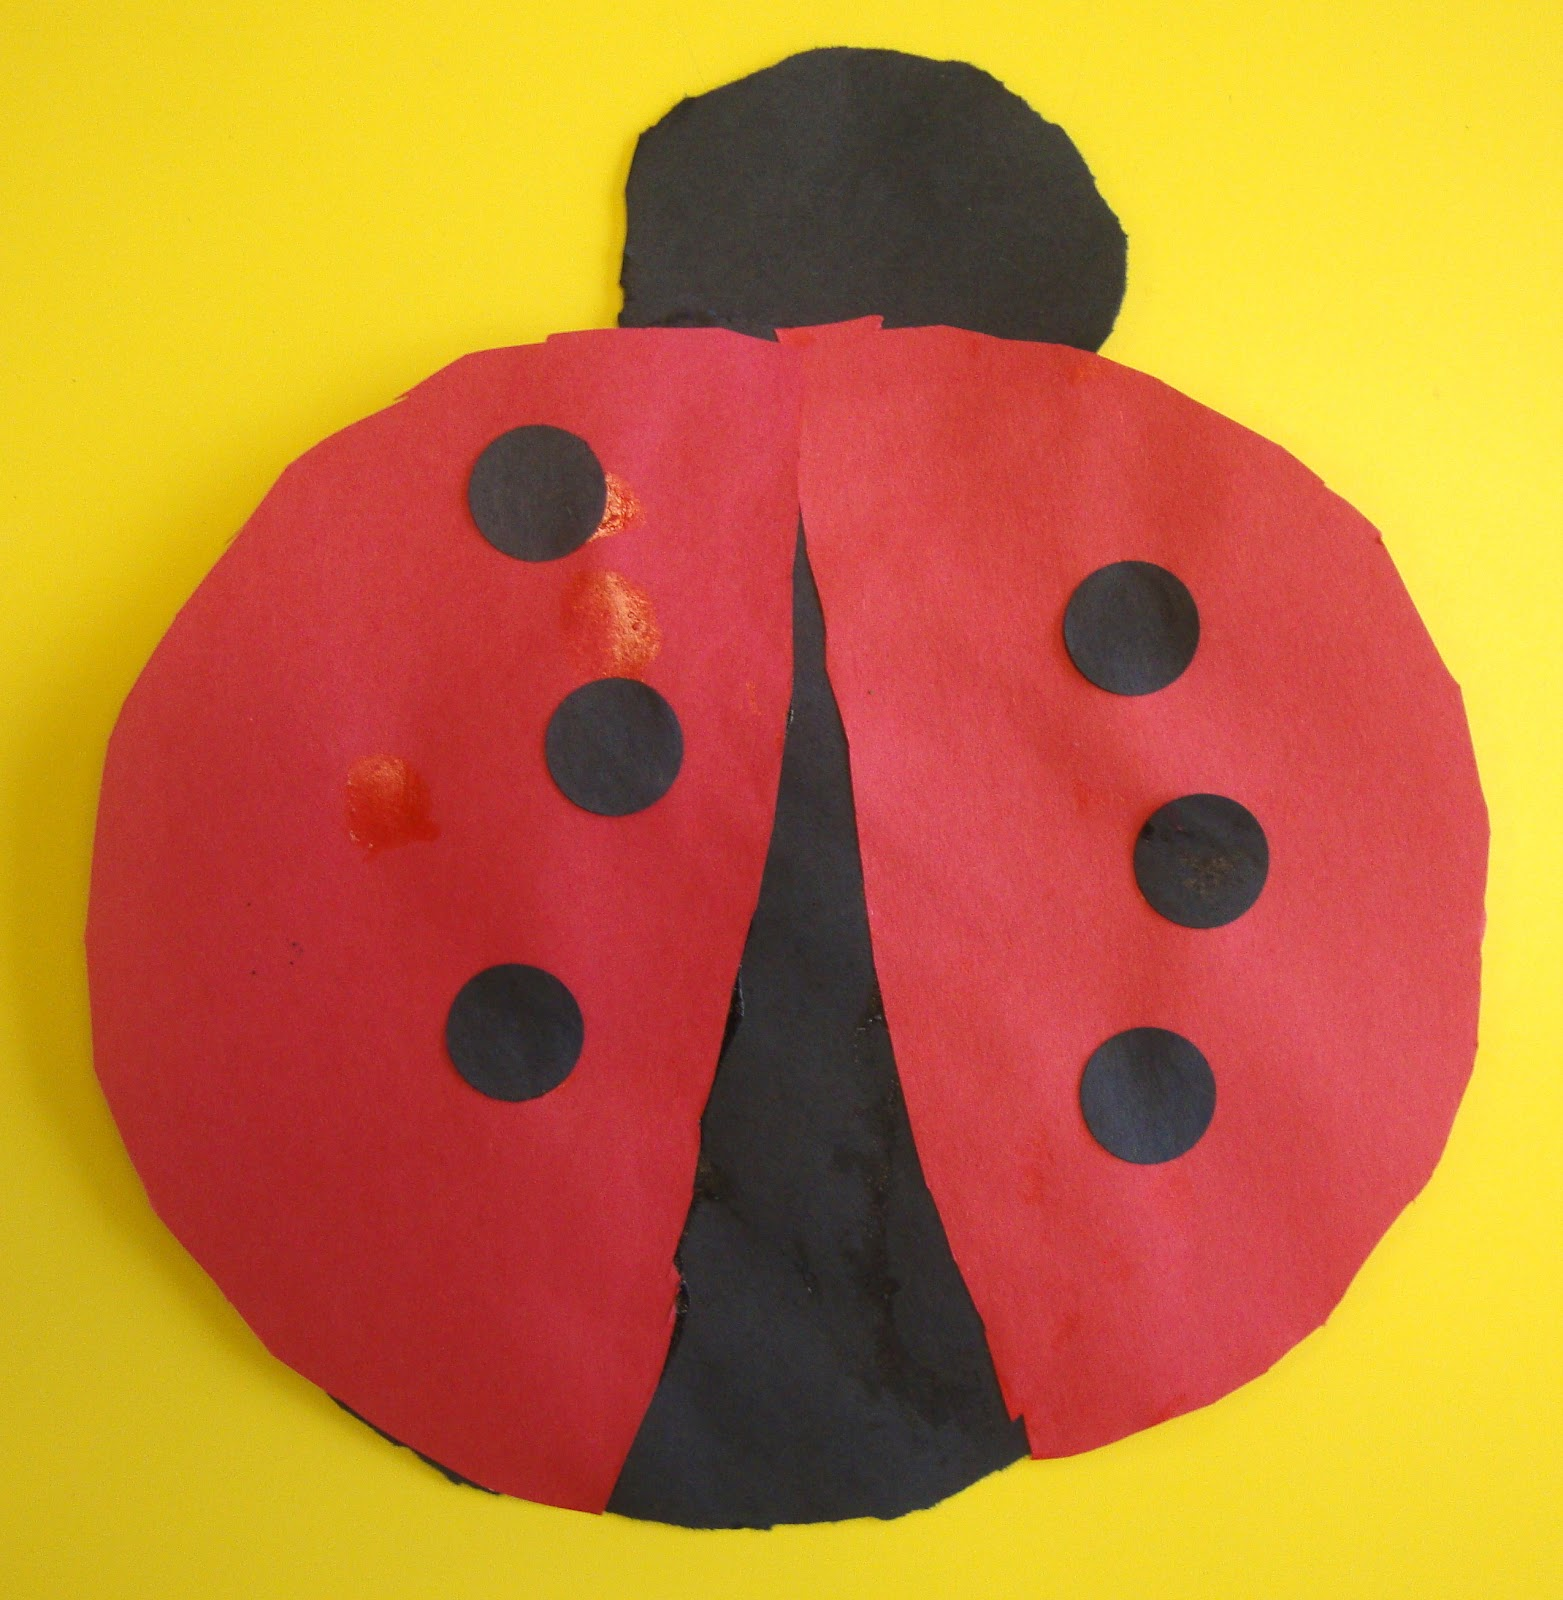 Lilu0027 Ladybugs & Art. Paper. Scissors. Glue!: Lilu0027 Ladybugs